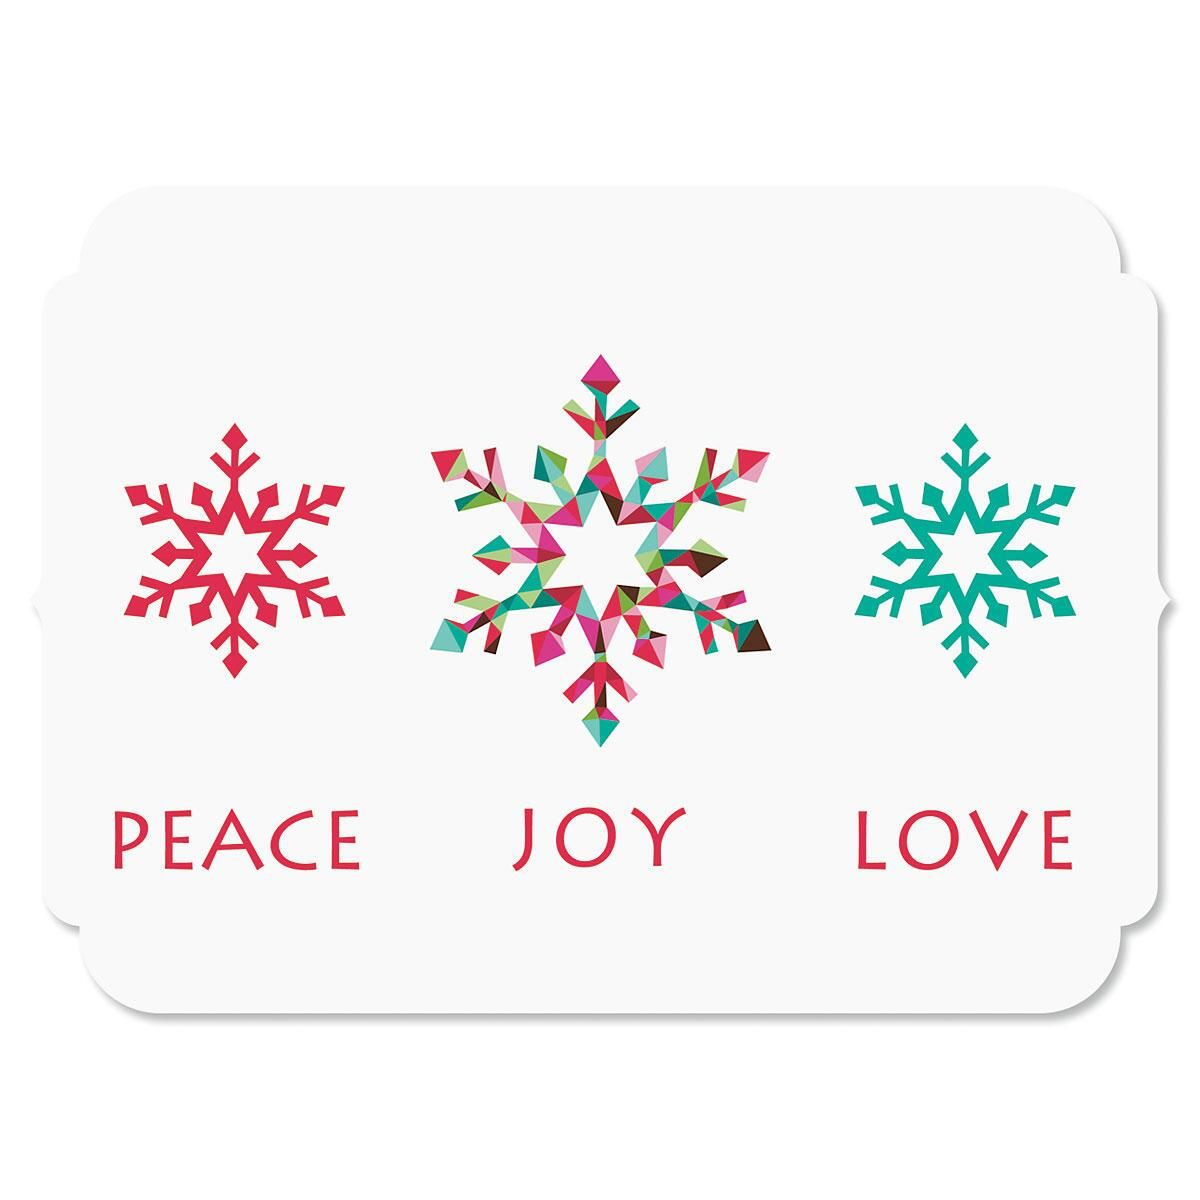 Snowflake Season Nonpersonalized Christmas Cards - Set of 18